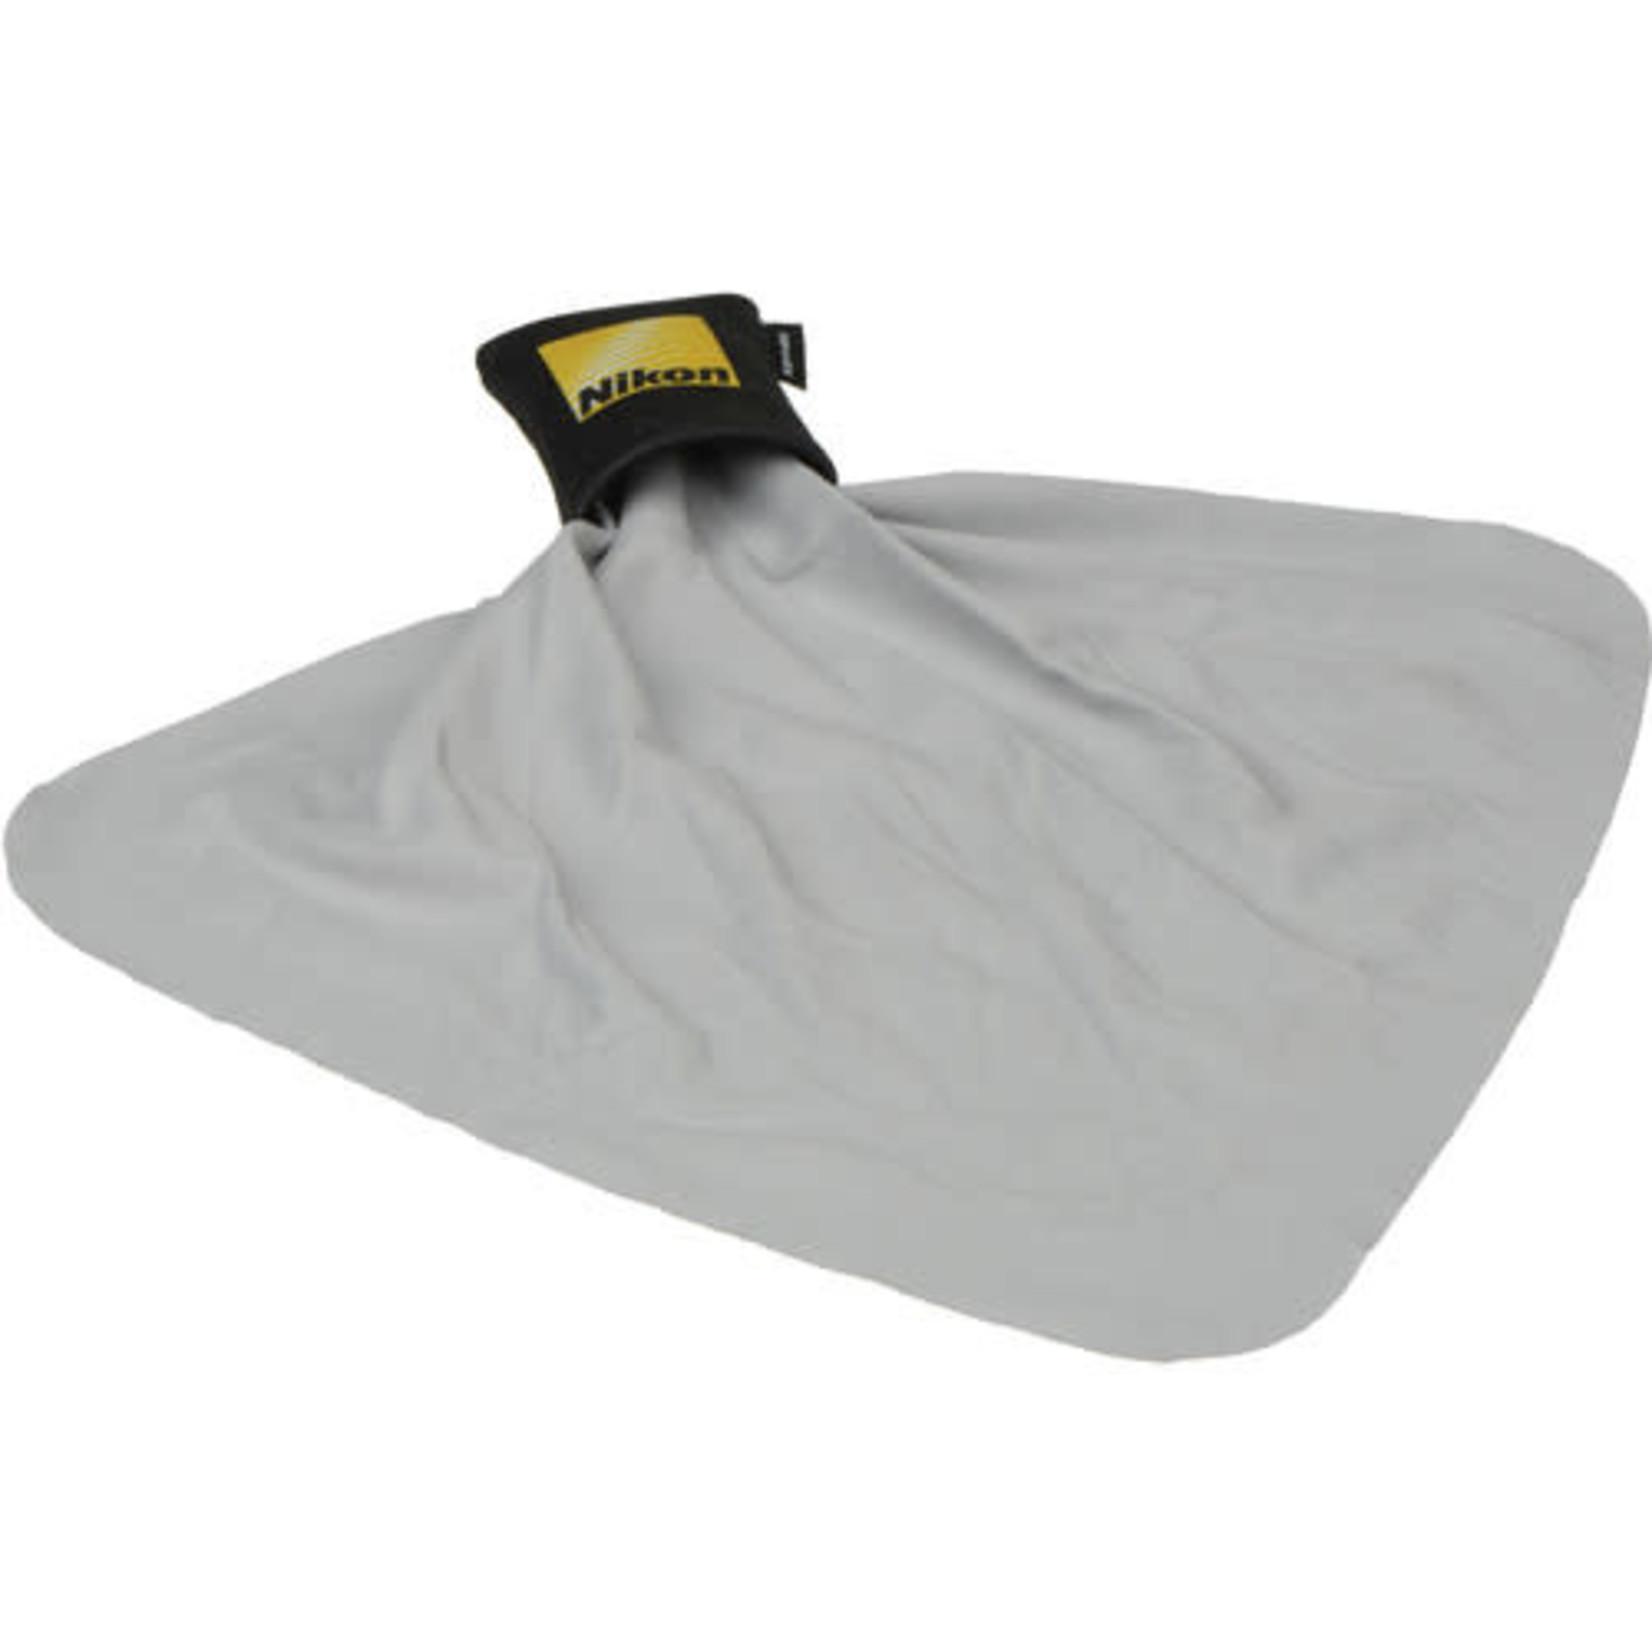 Nikon Nikon Micro Fiber Cleaning Cloth (Large)